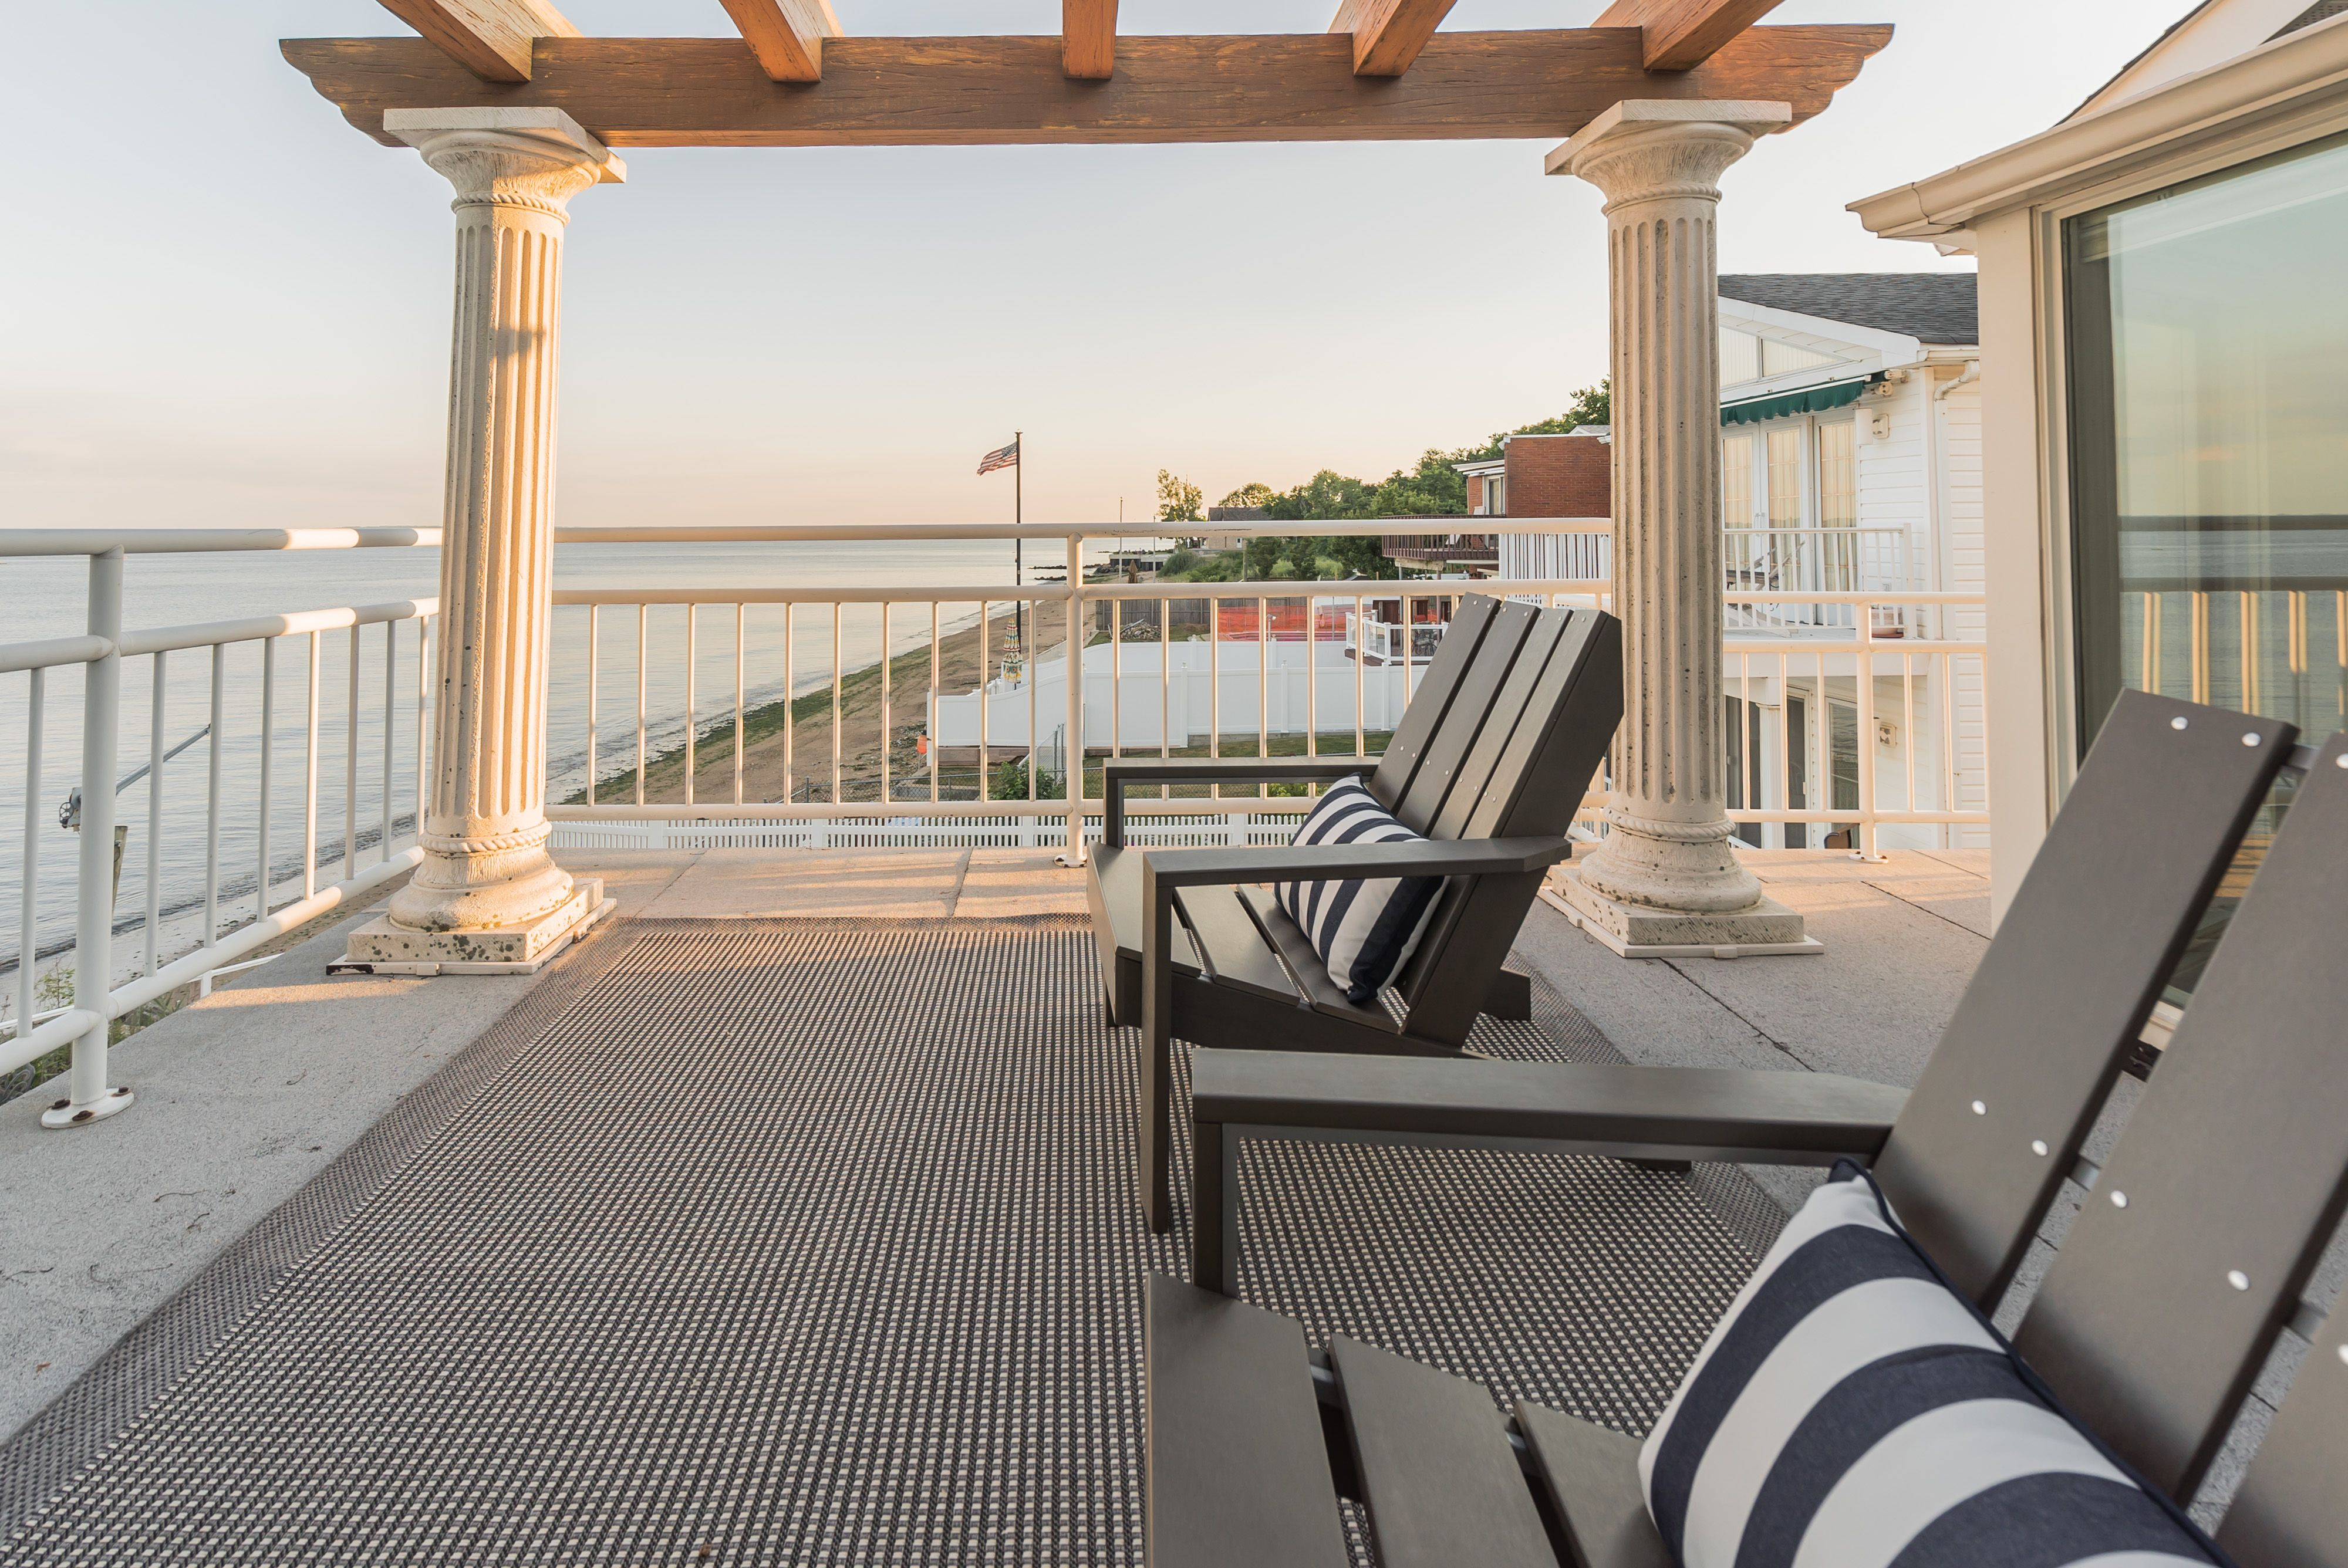 Home For Sale: 545 Tennyson Drive, Eltingville, Staten ...